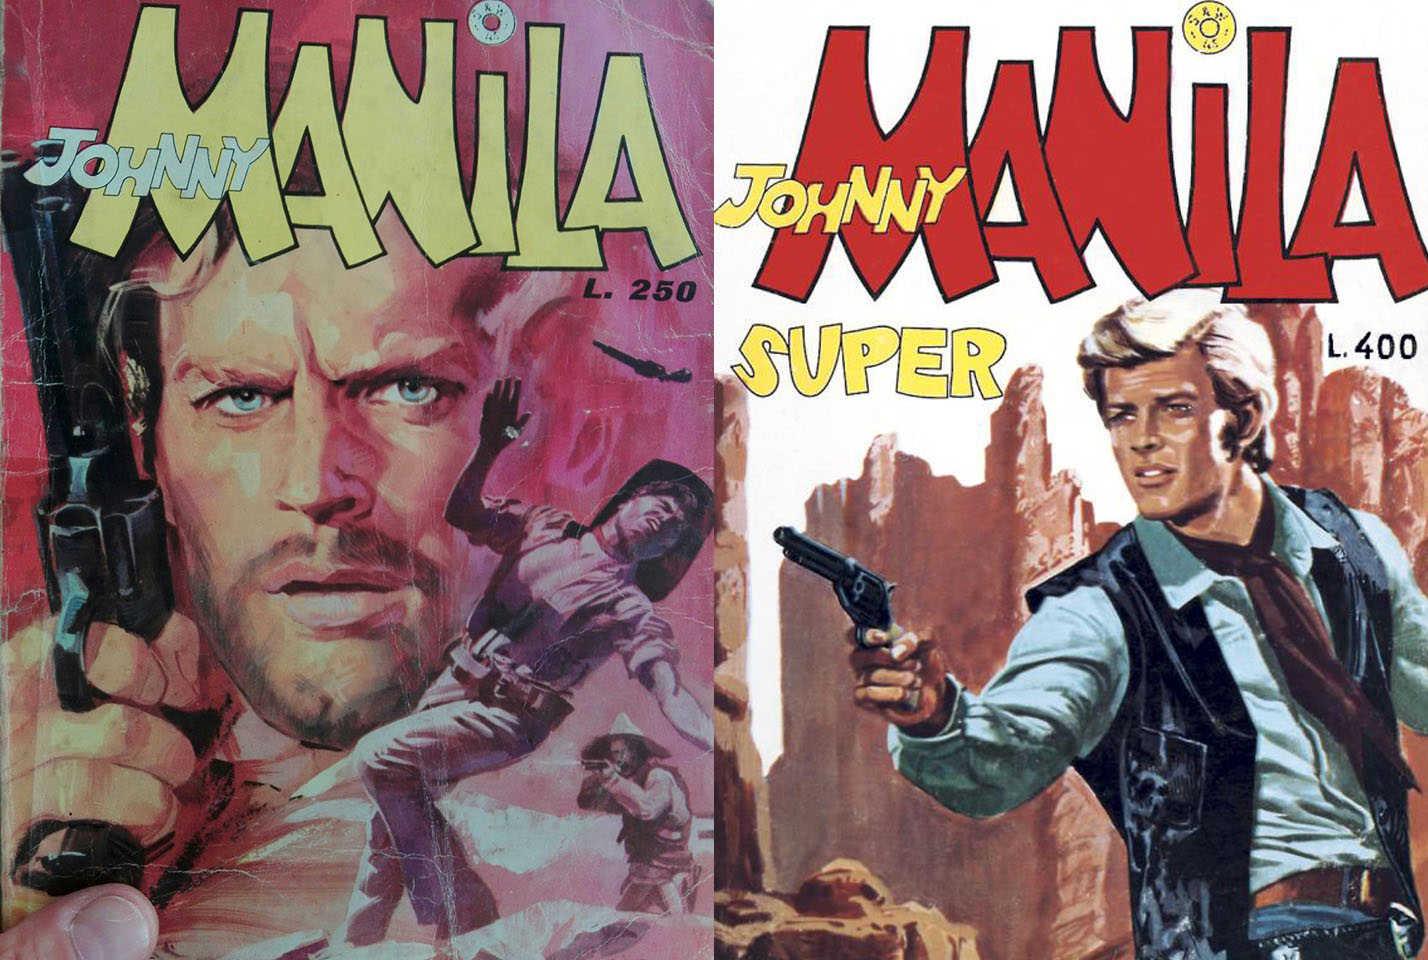 Fumetto Italiano Vintage: Johnny Manila